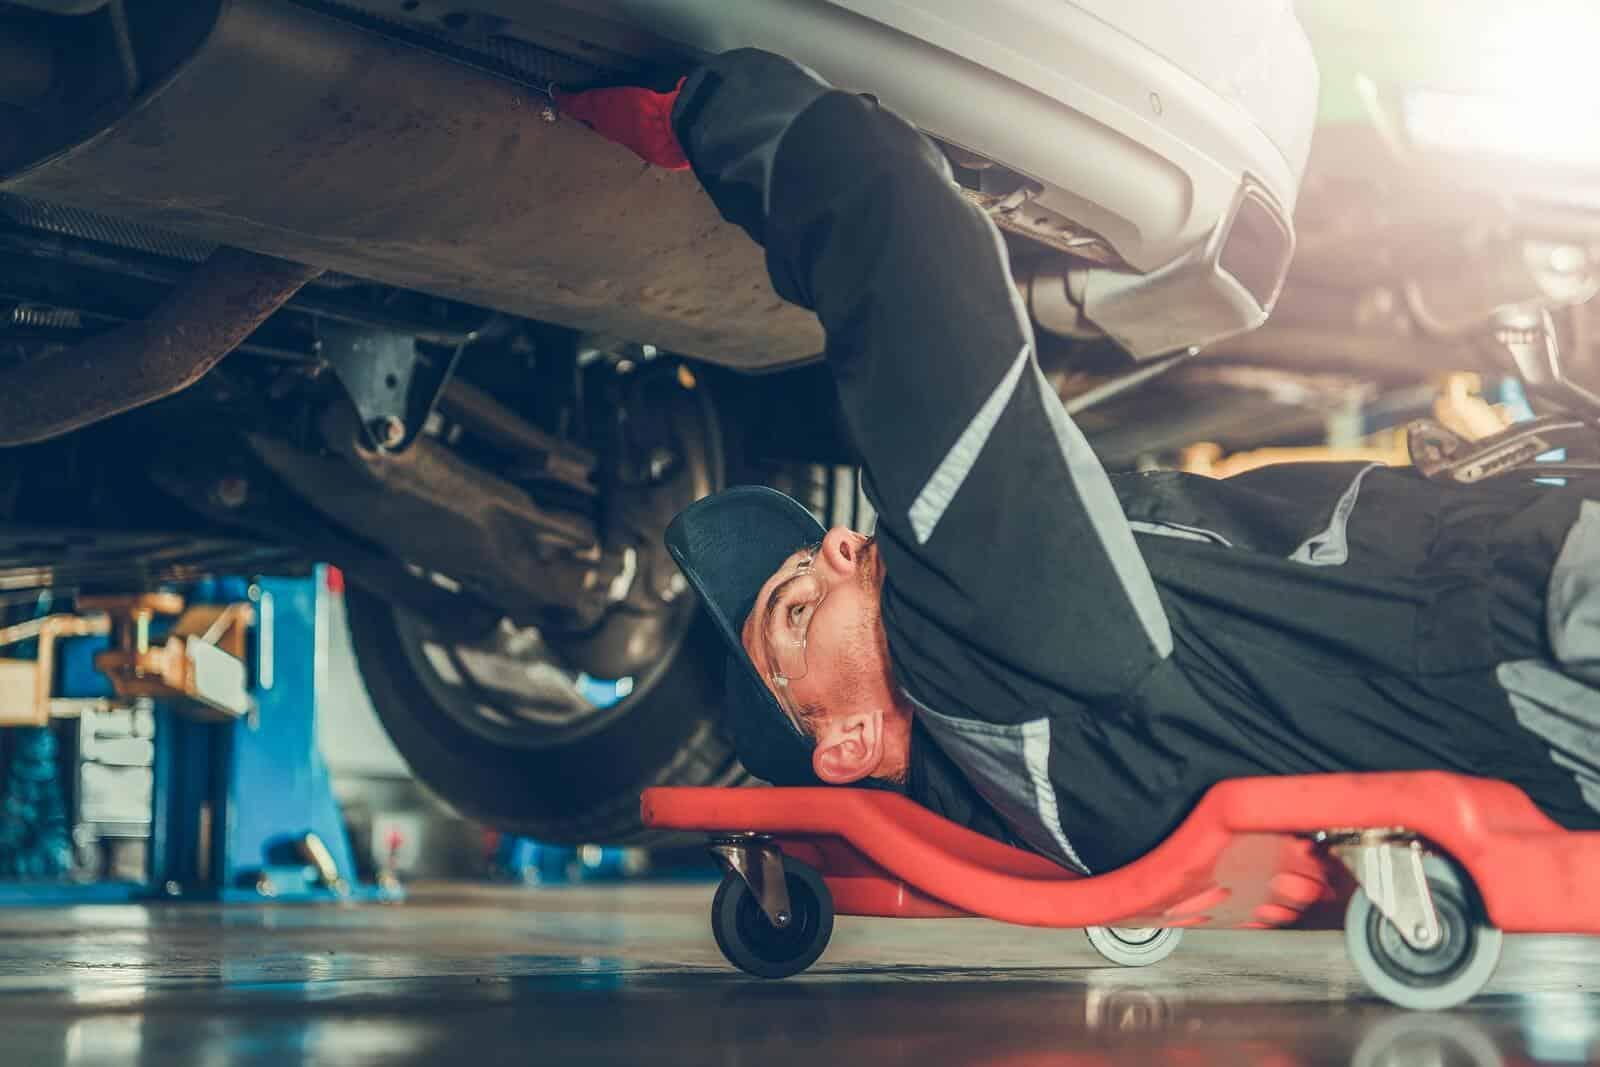 Car mechanic beneath car